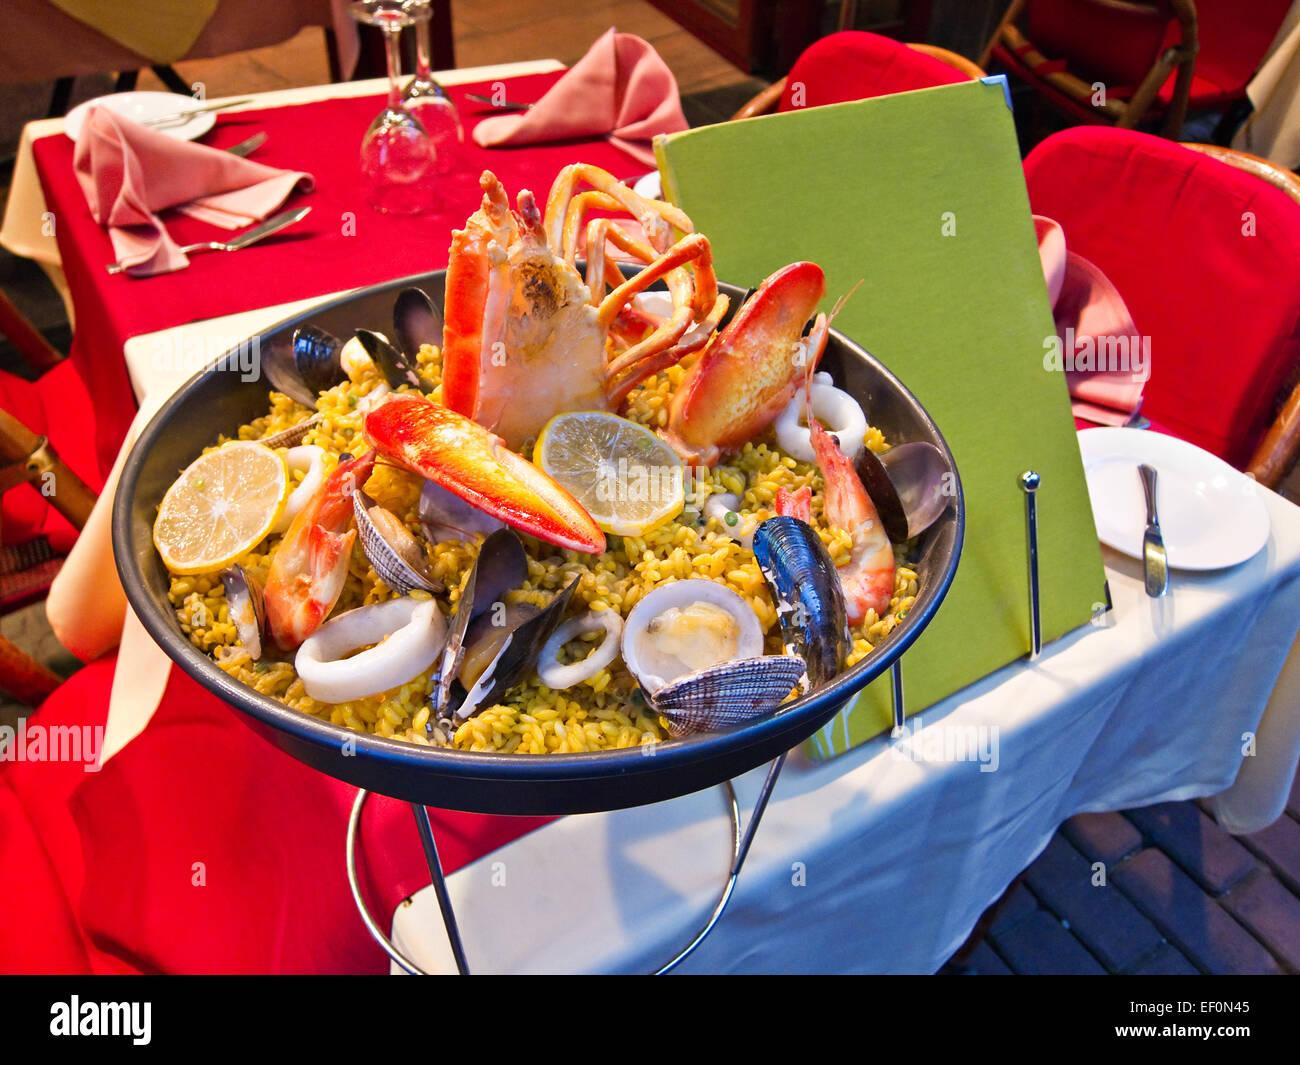 Paella - Stock Image